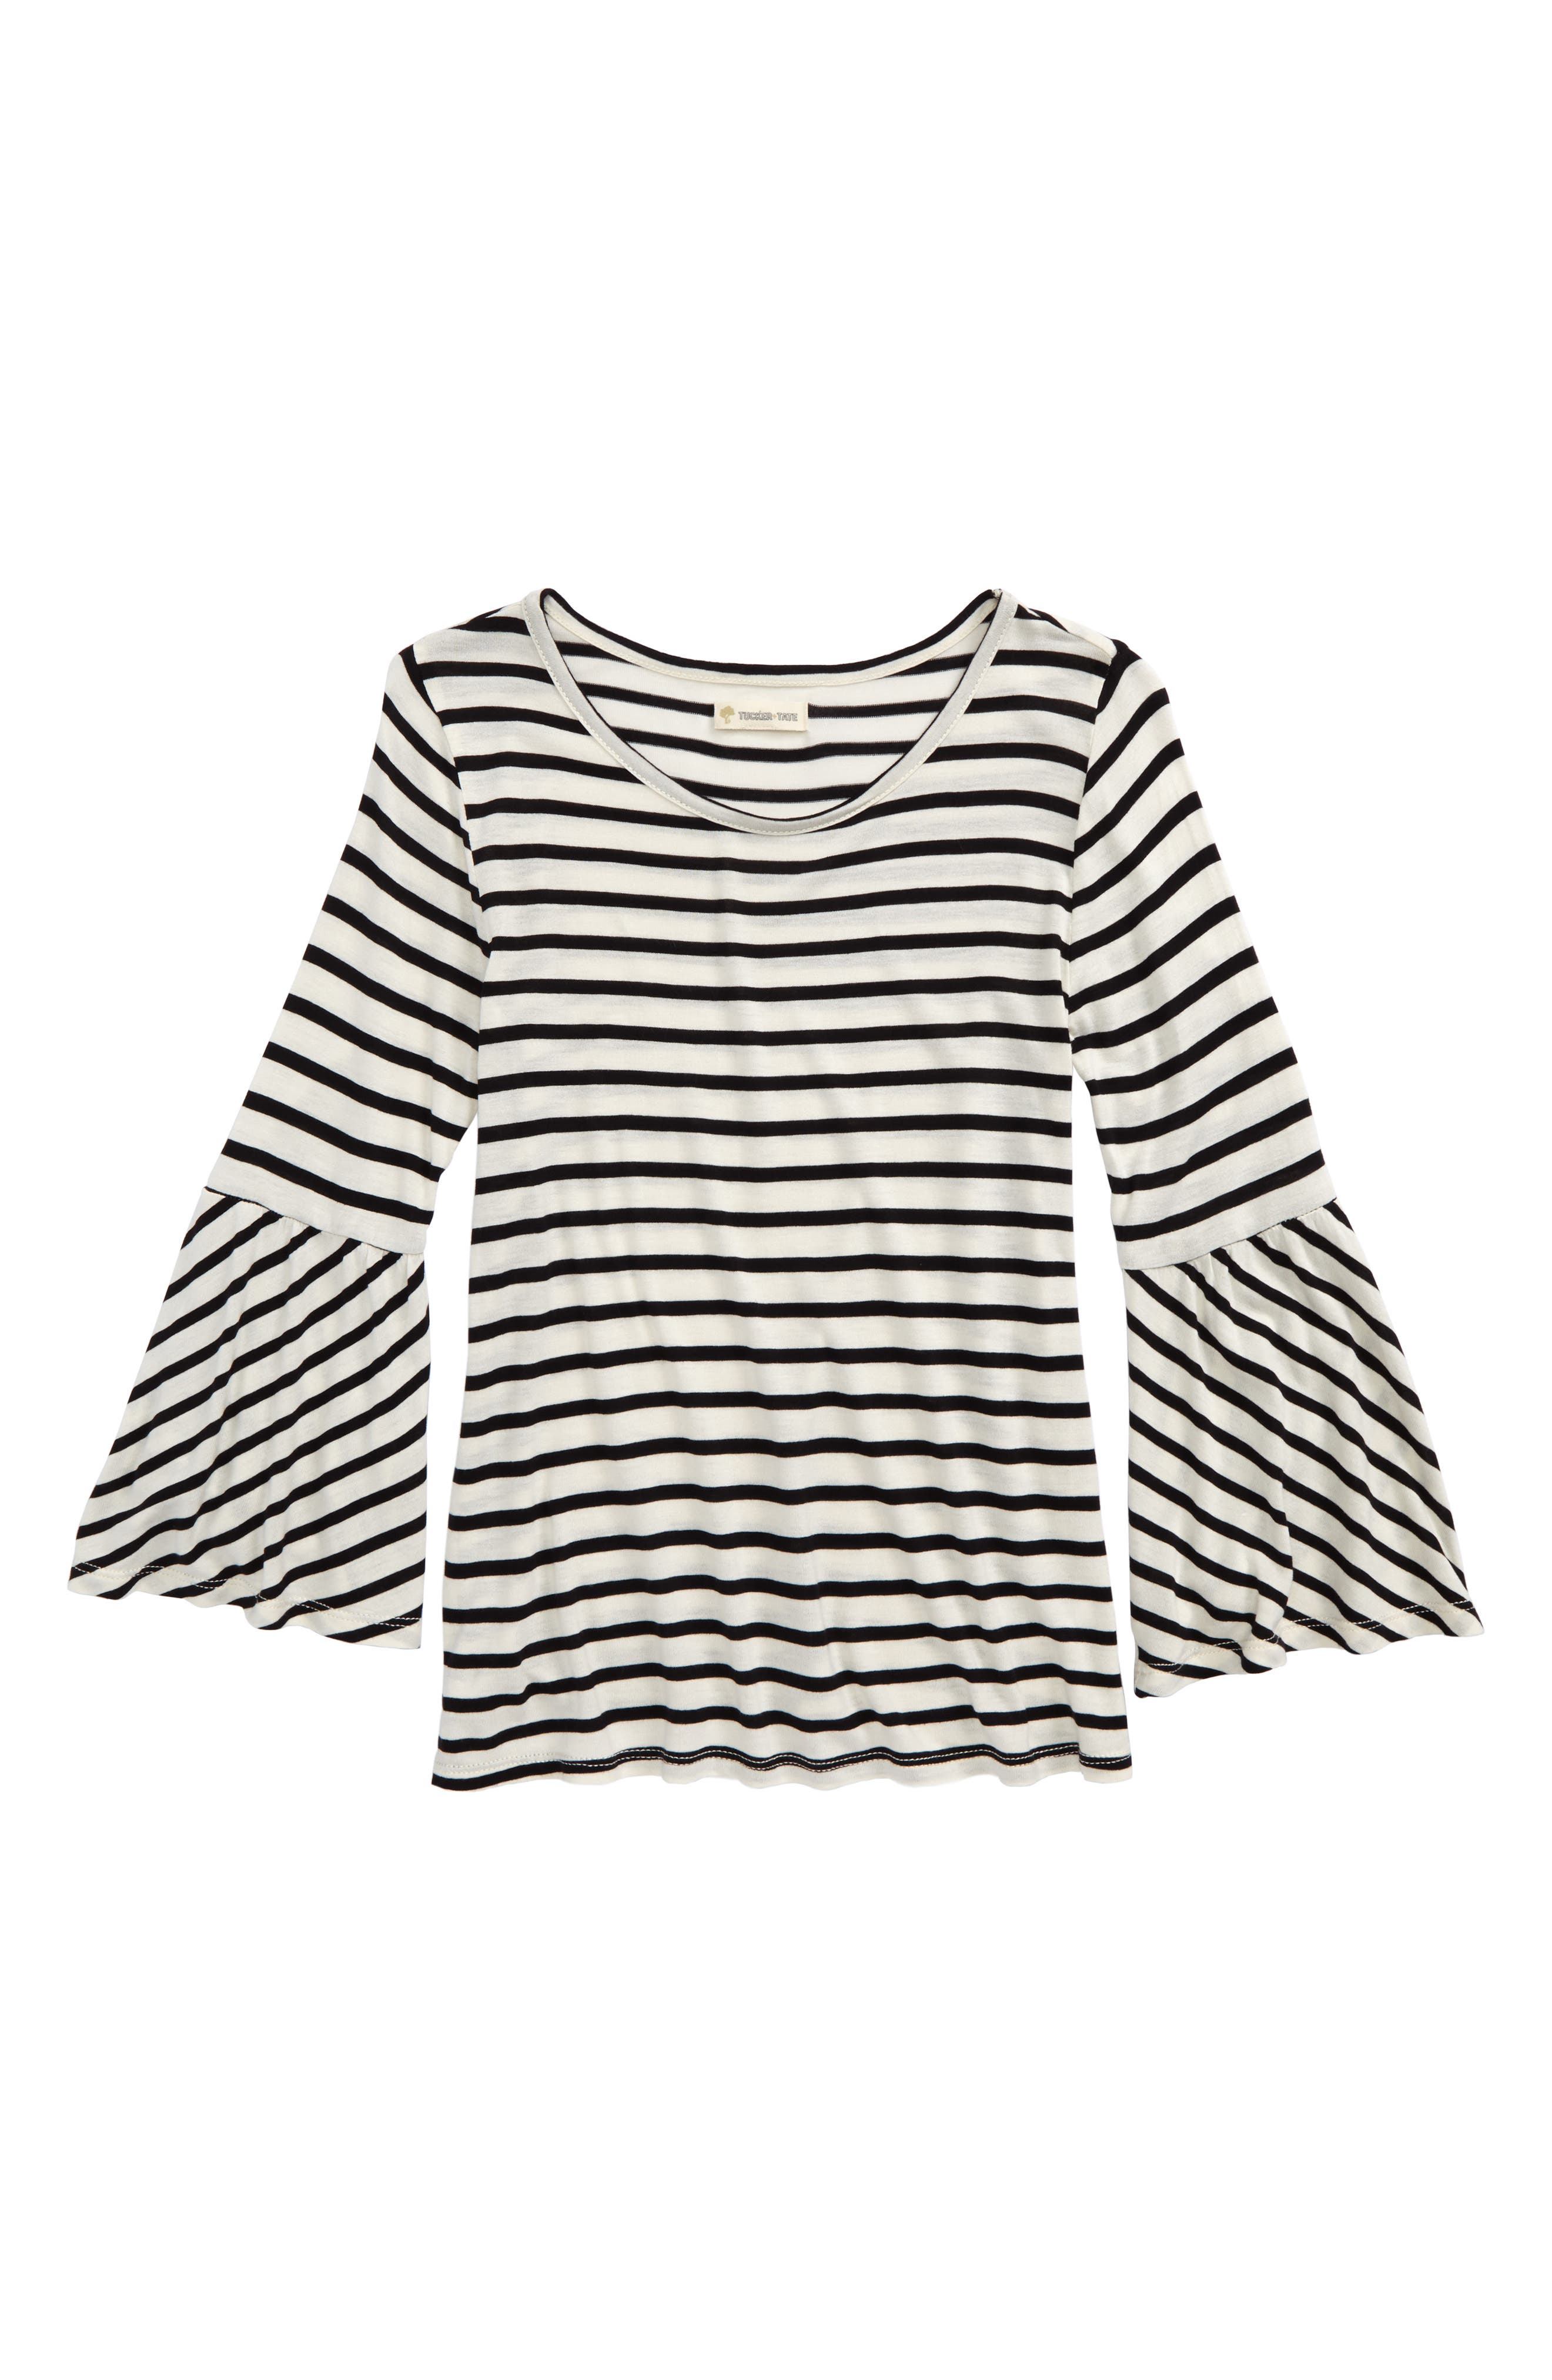 Bell Sleeve Tee,                             Main thumbnail 1, color,                             Ivory Egret- Black Stripe